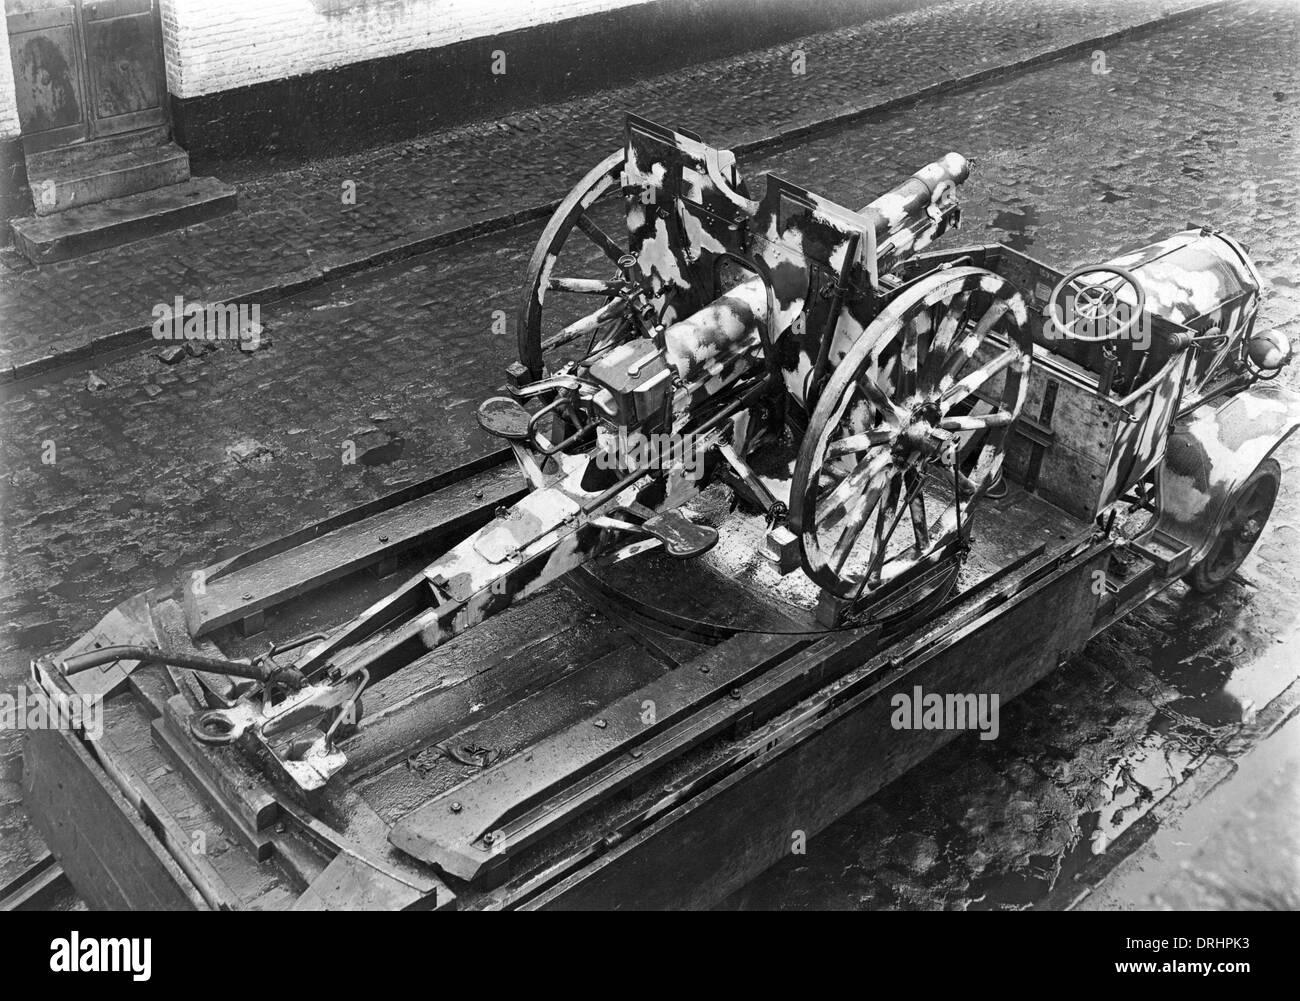 German field gun on a lorry, France, WW1 - Stock Image